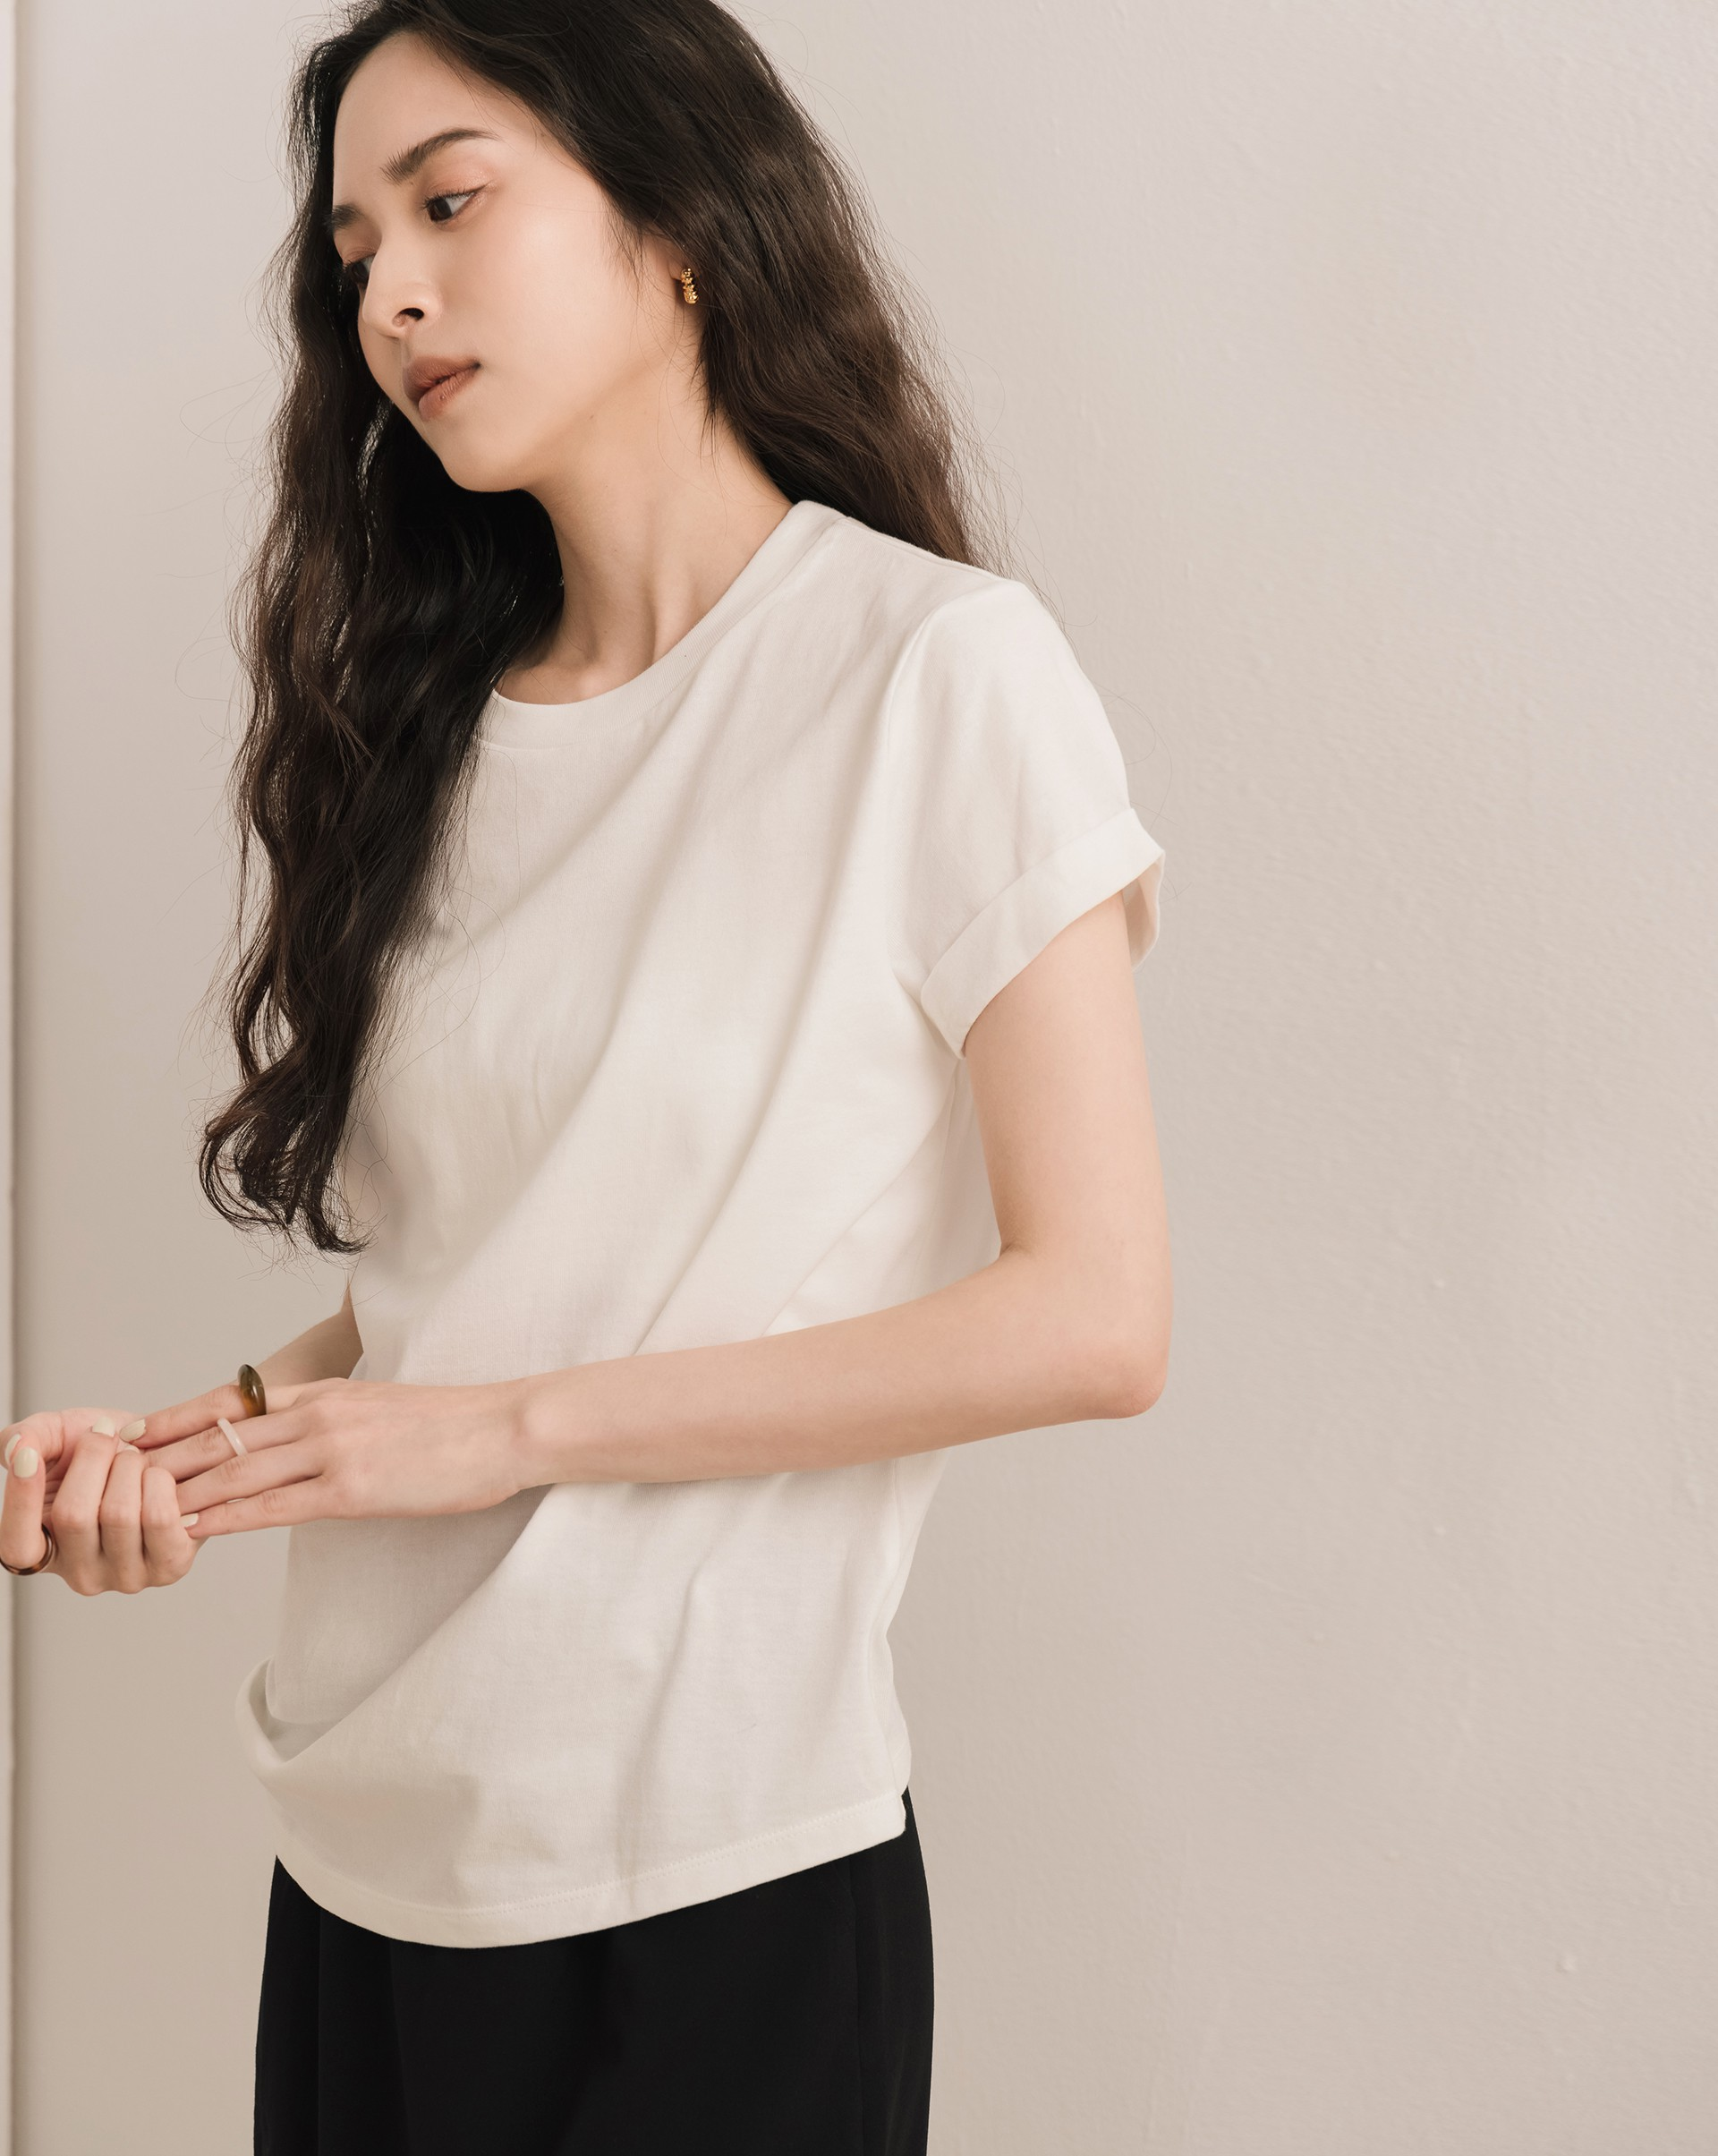 PROJECT.M 修身版袖反褶短袖上衣-Meierq